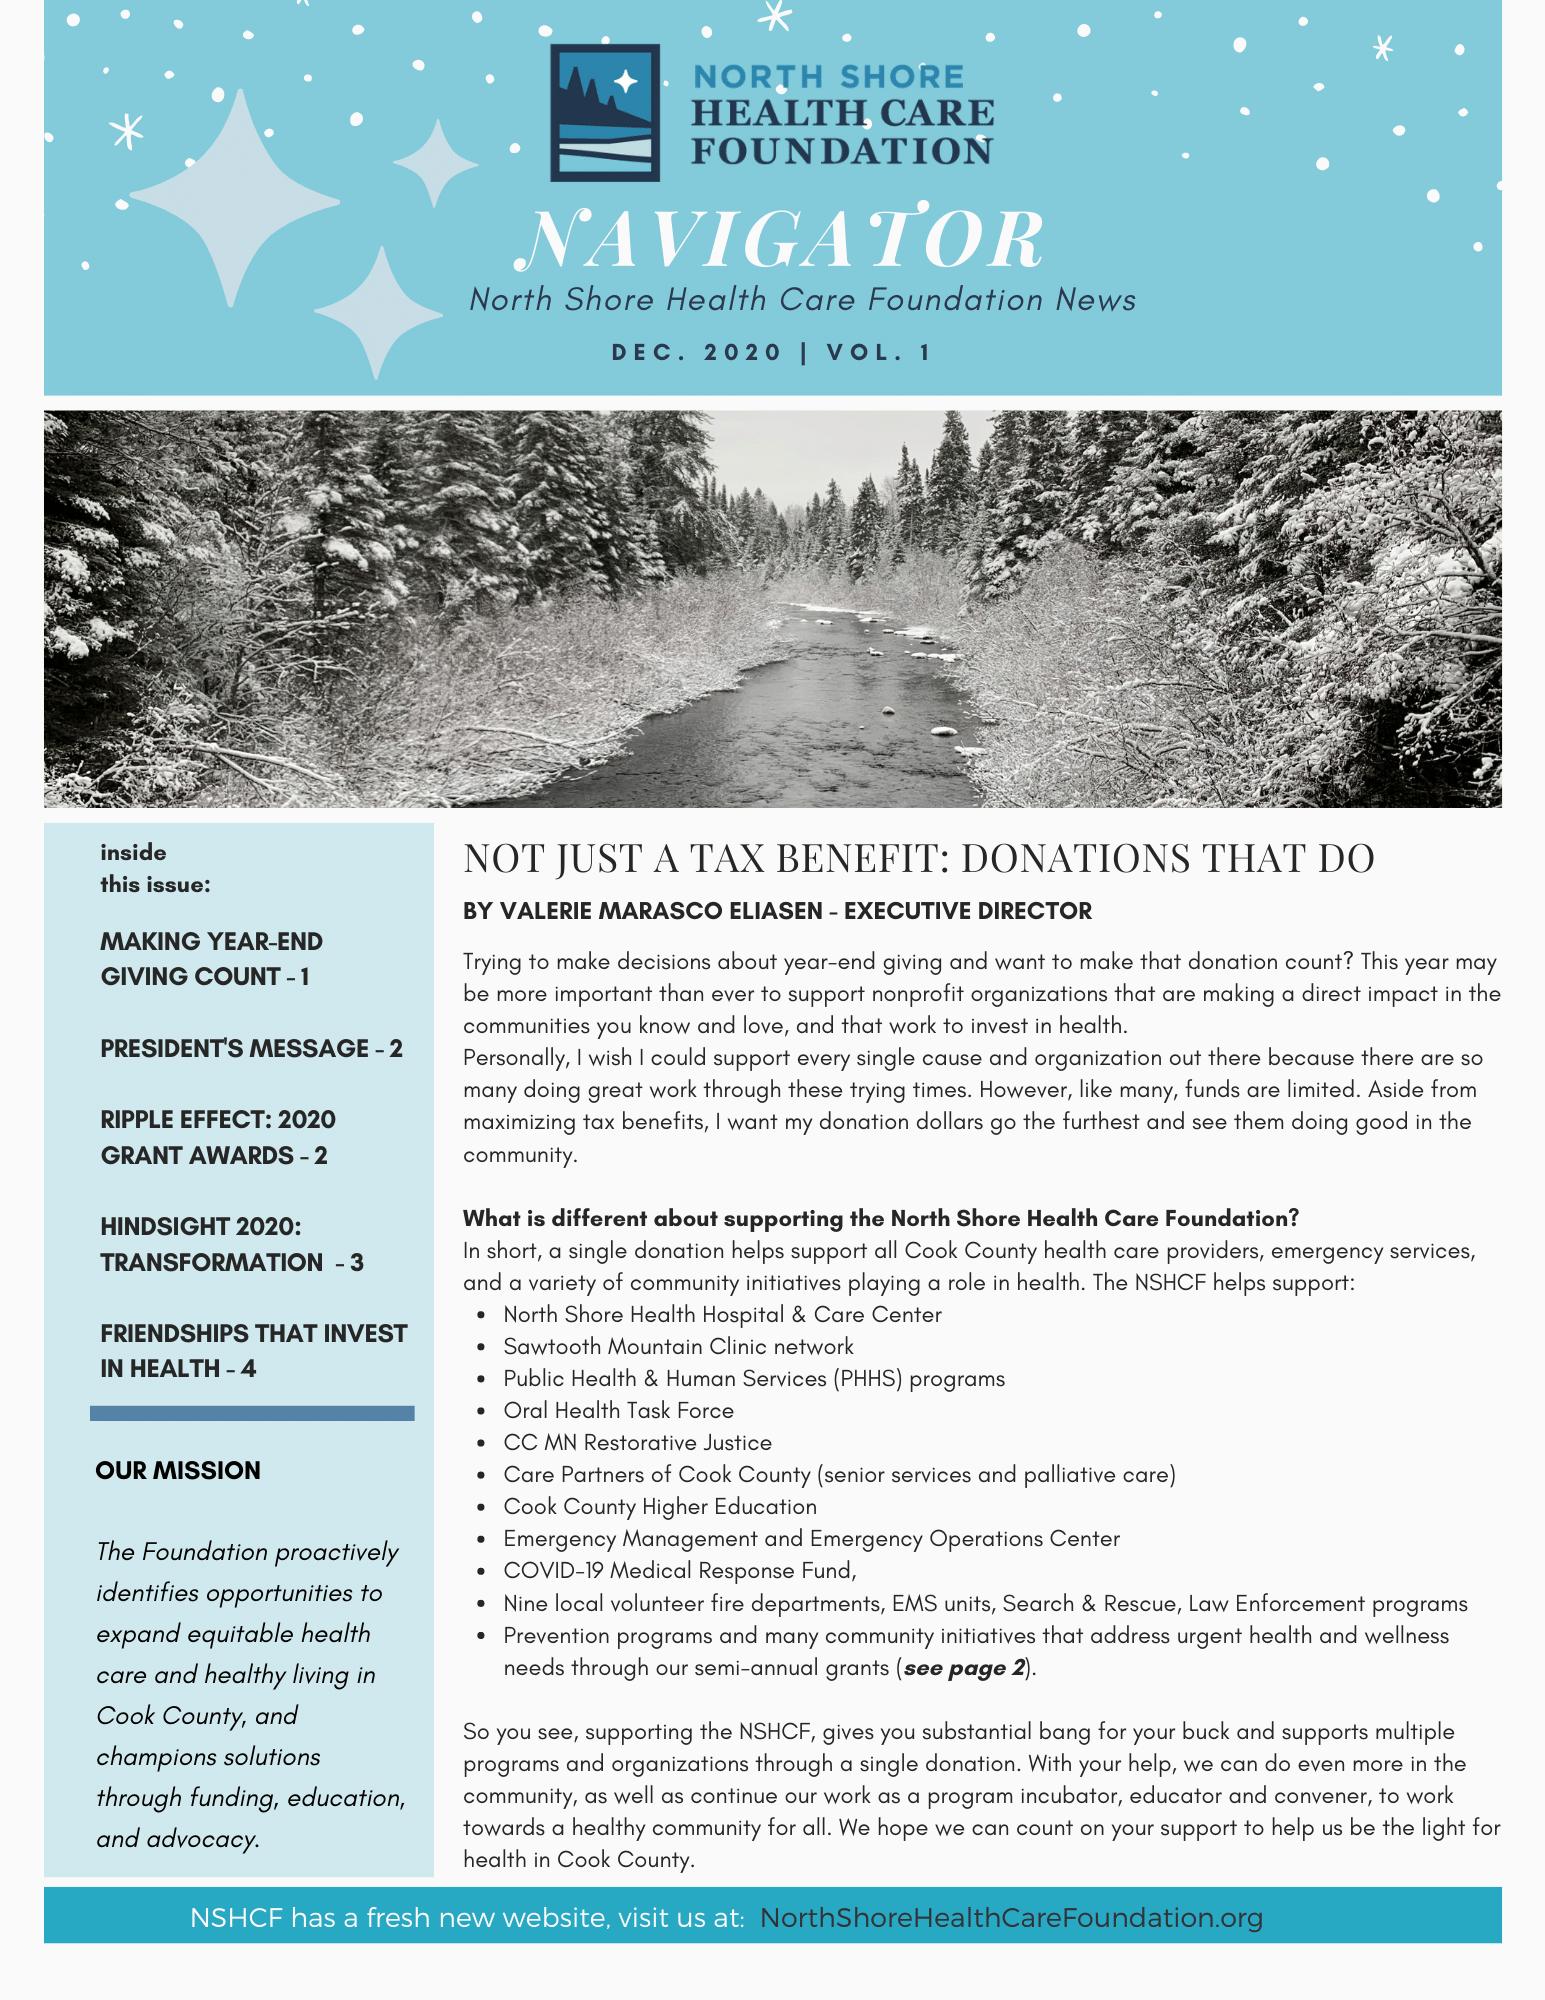 December 2020 Edition of the NSHCF Navigator